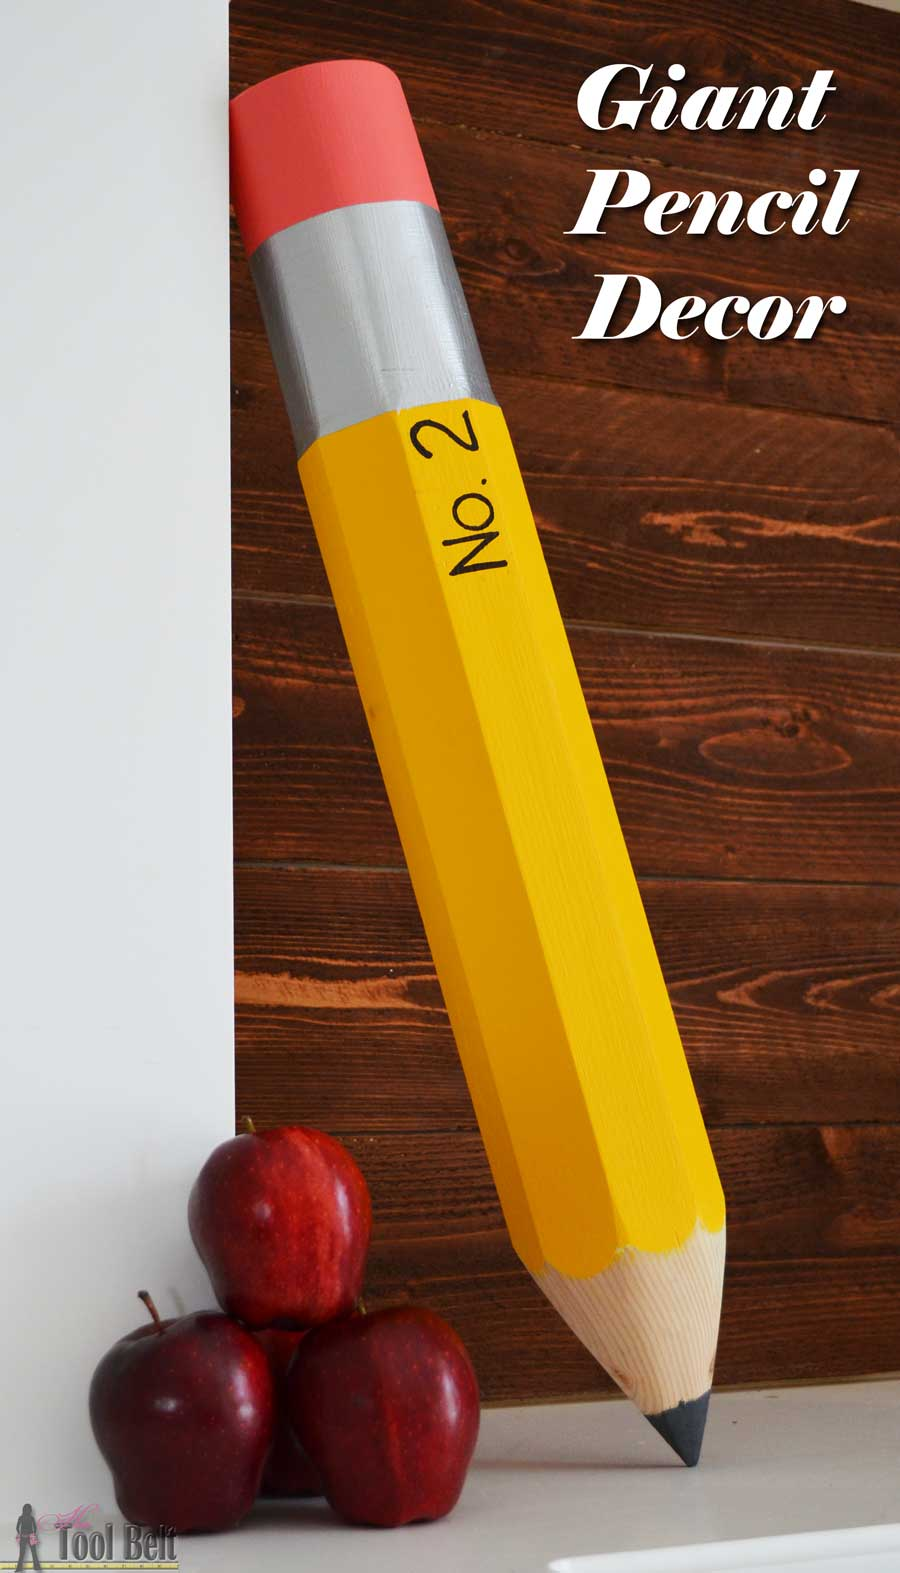 Classroom Decoration Teacher ~ Giant pencil decoration her tool belt